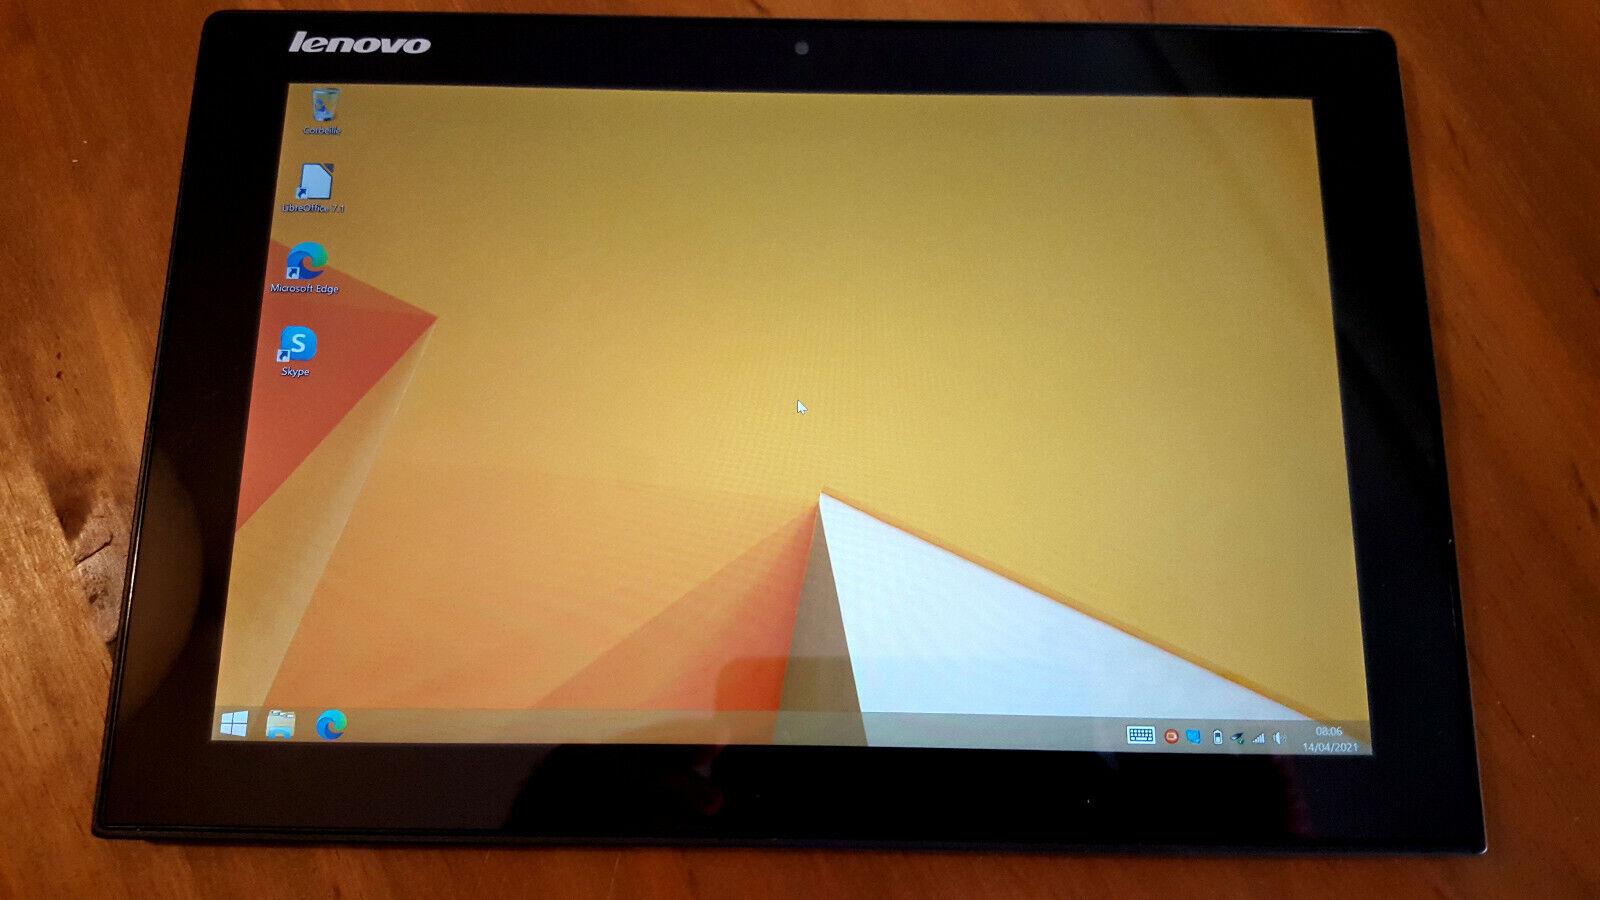 Lenovo miix 3 - 1030 - ram 2 go - ssd 64 go + sd 64 go - tablette windows 8.1